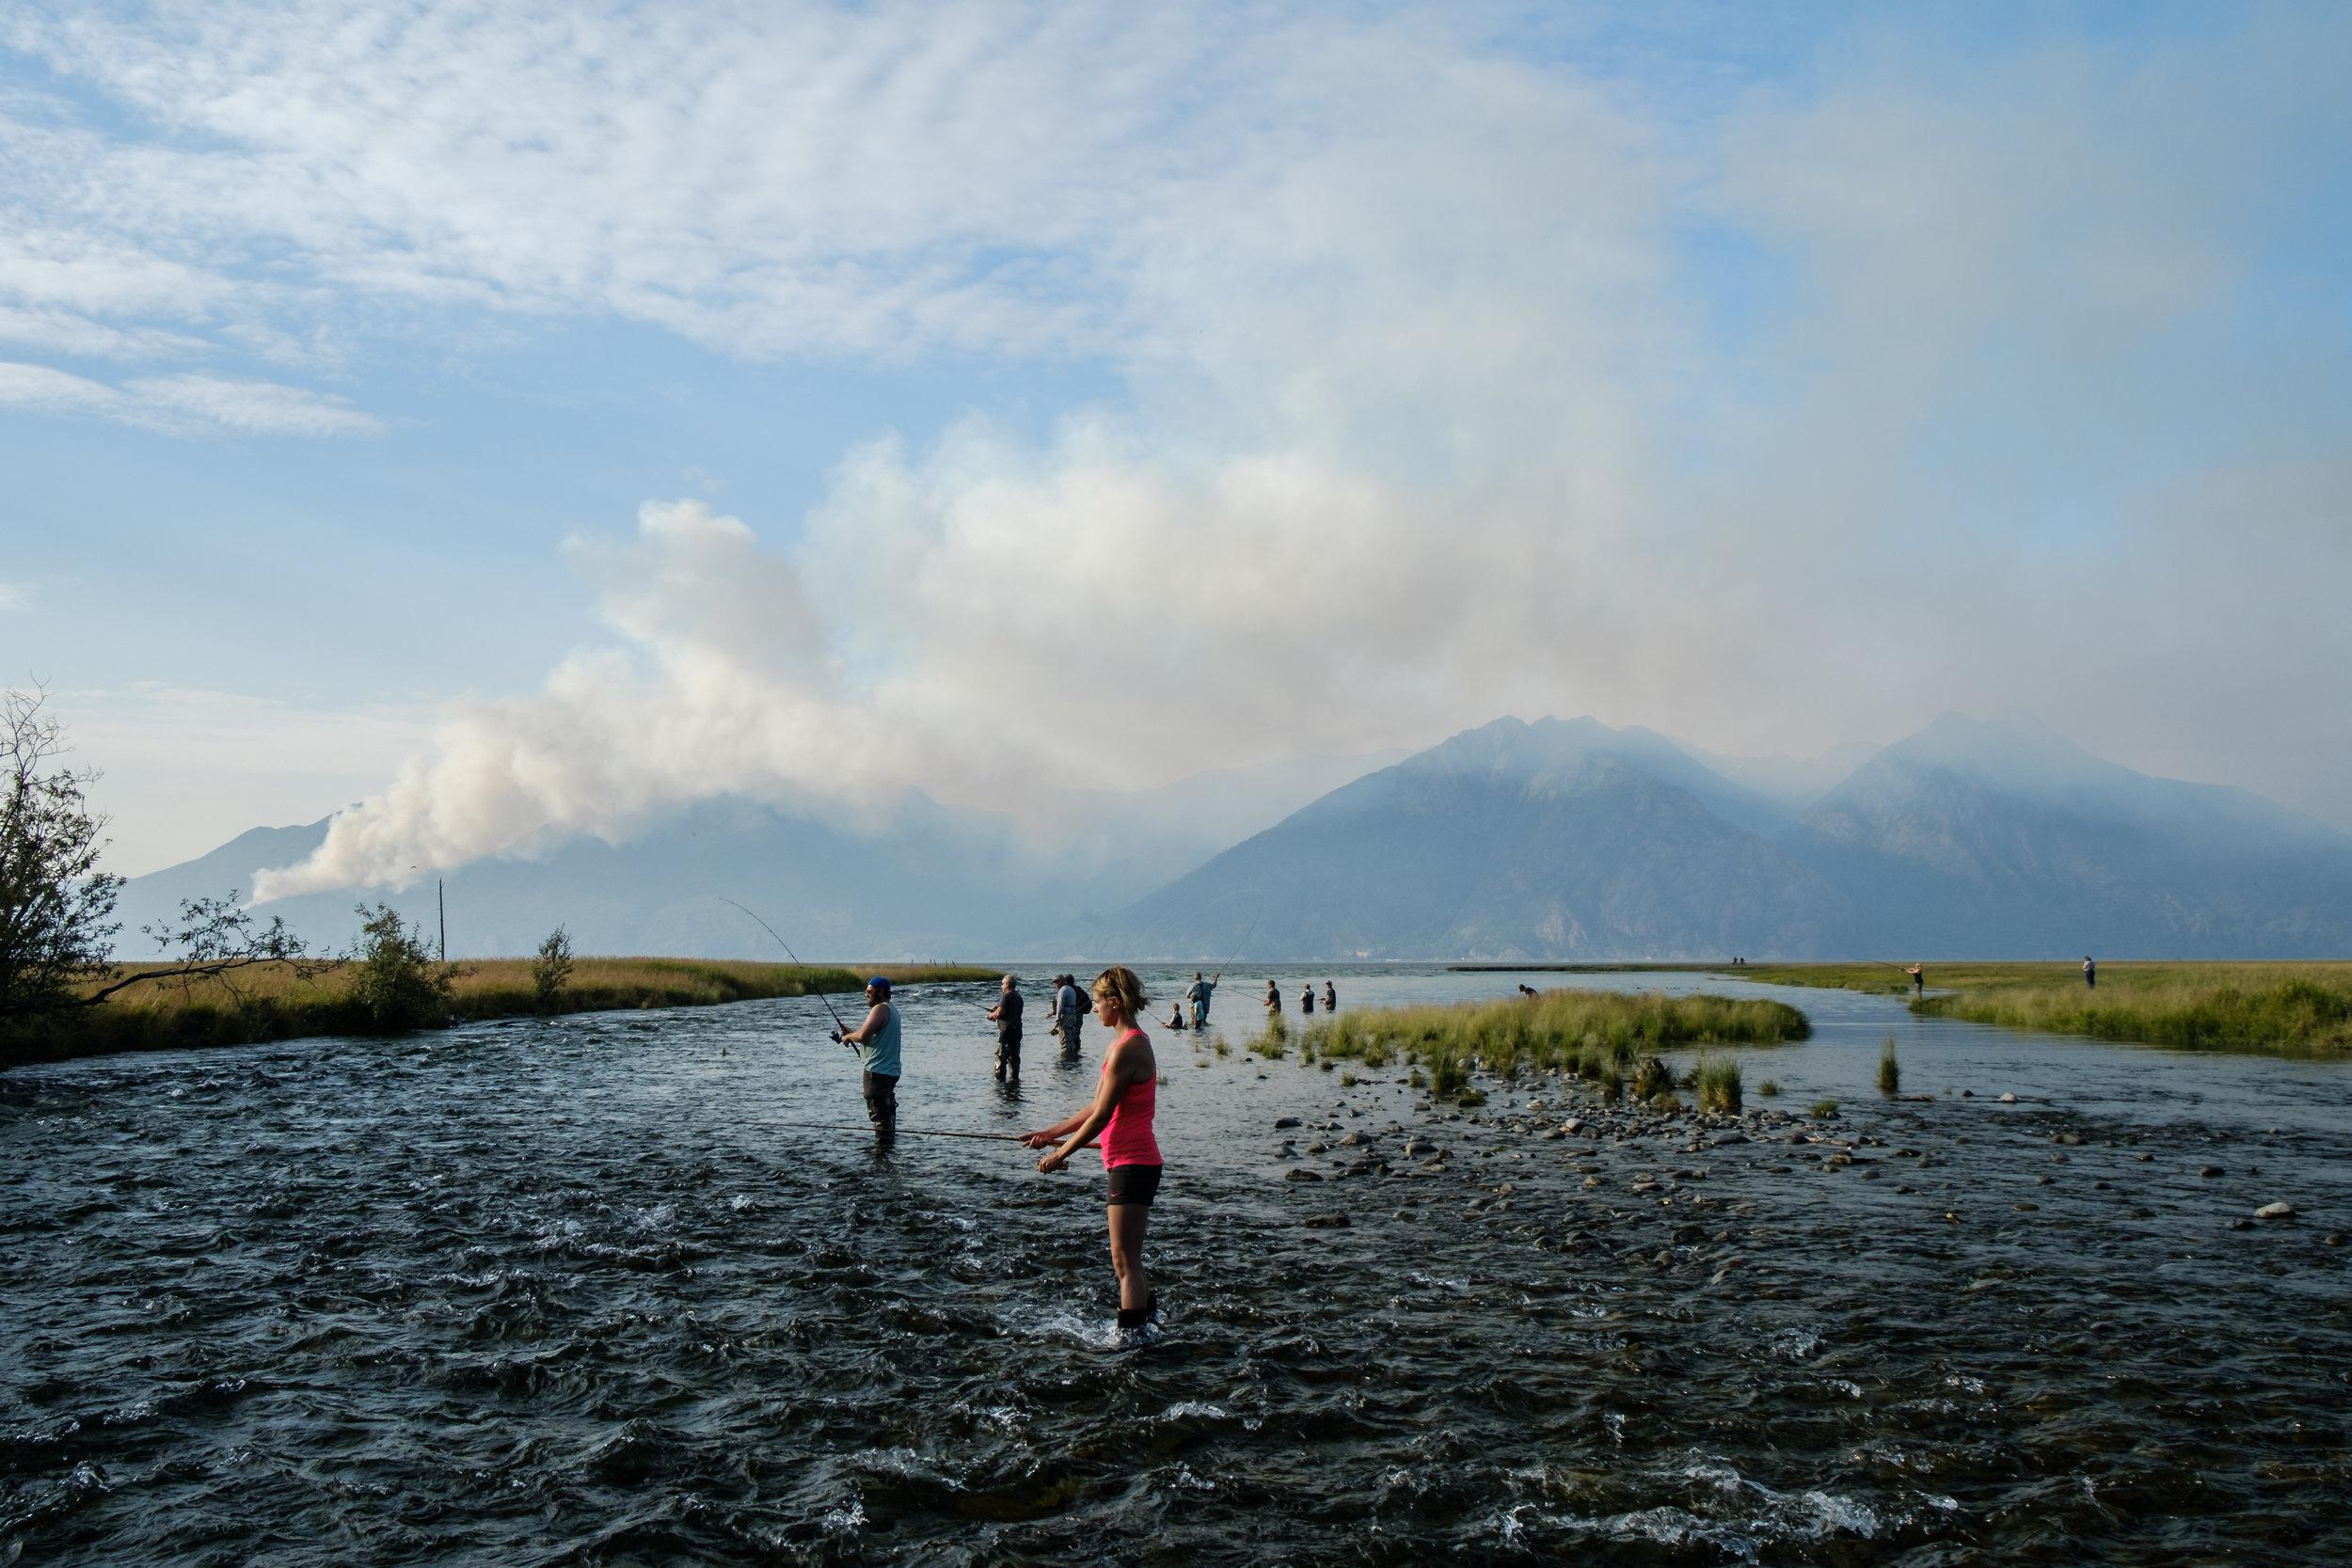 Typical Alaska fishing scene